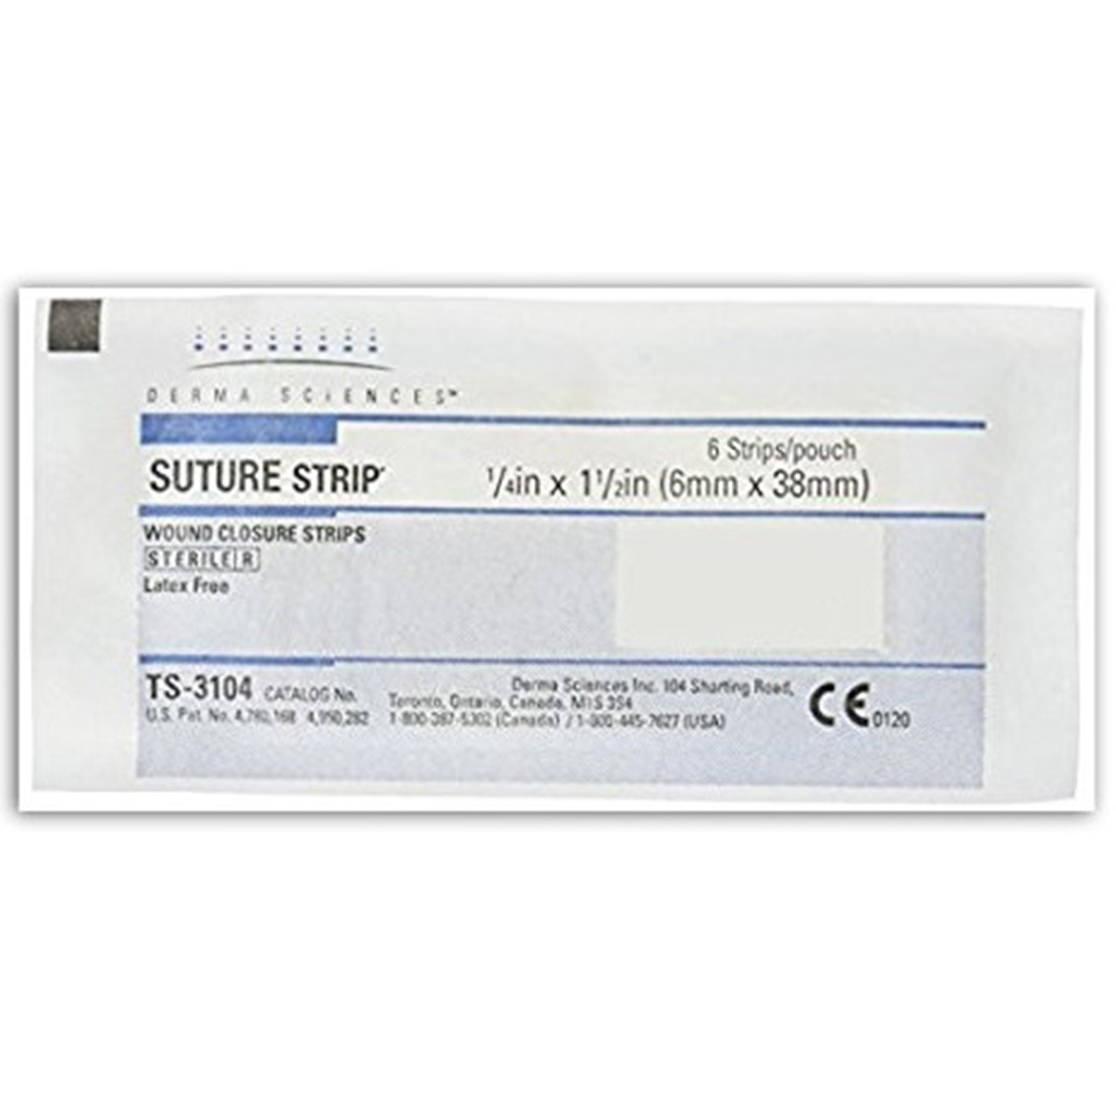 "Derma sciences shur strips wound closure strip 1/4"" x 1-1/2"""